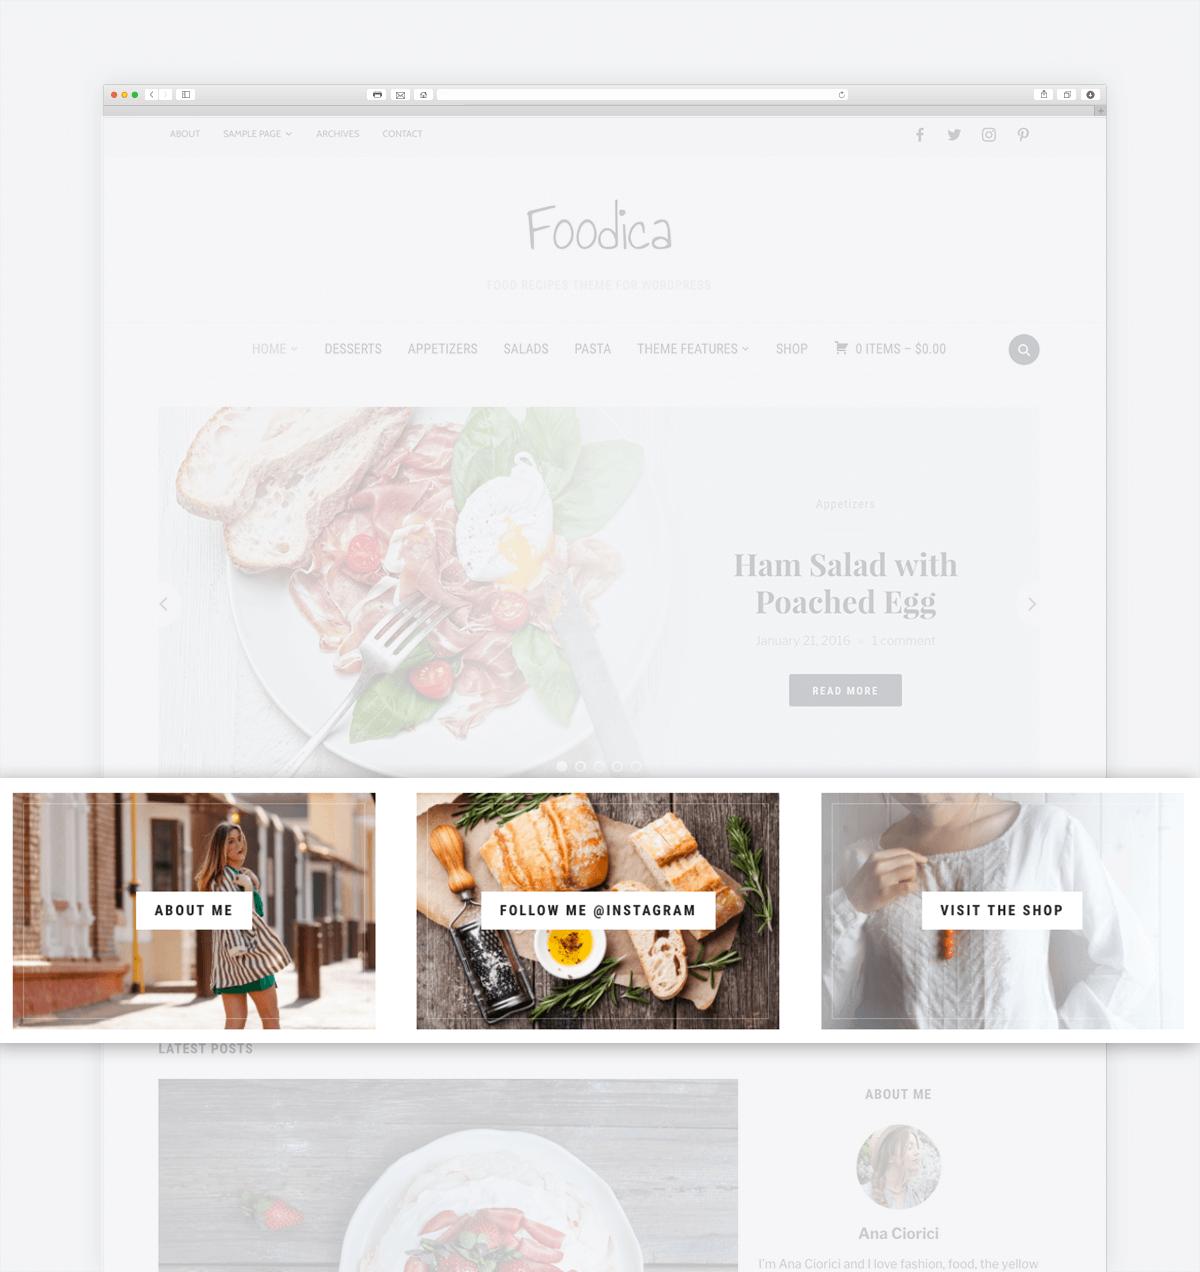 foodica-image-box-widget